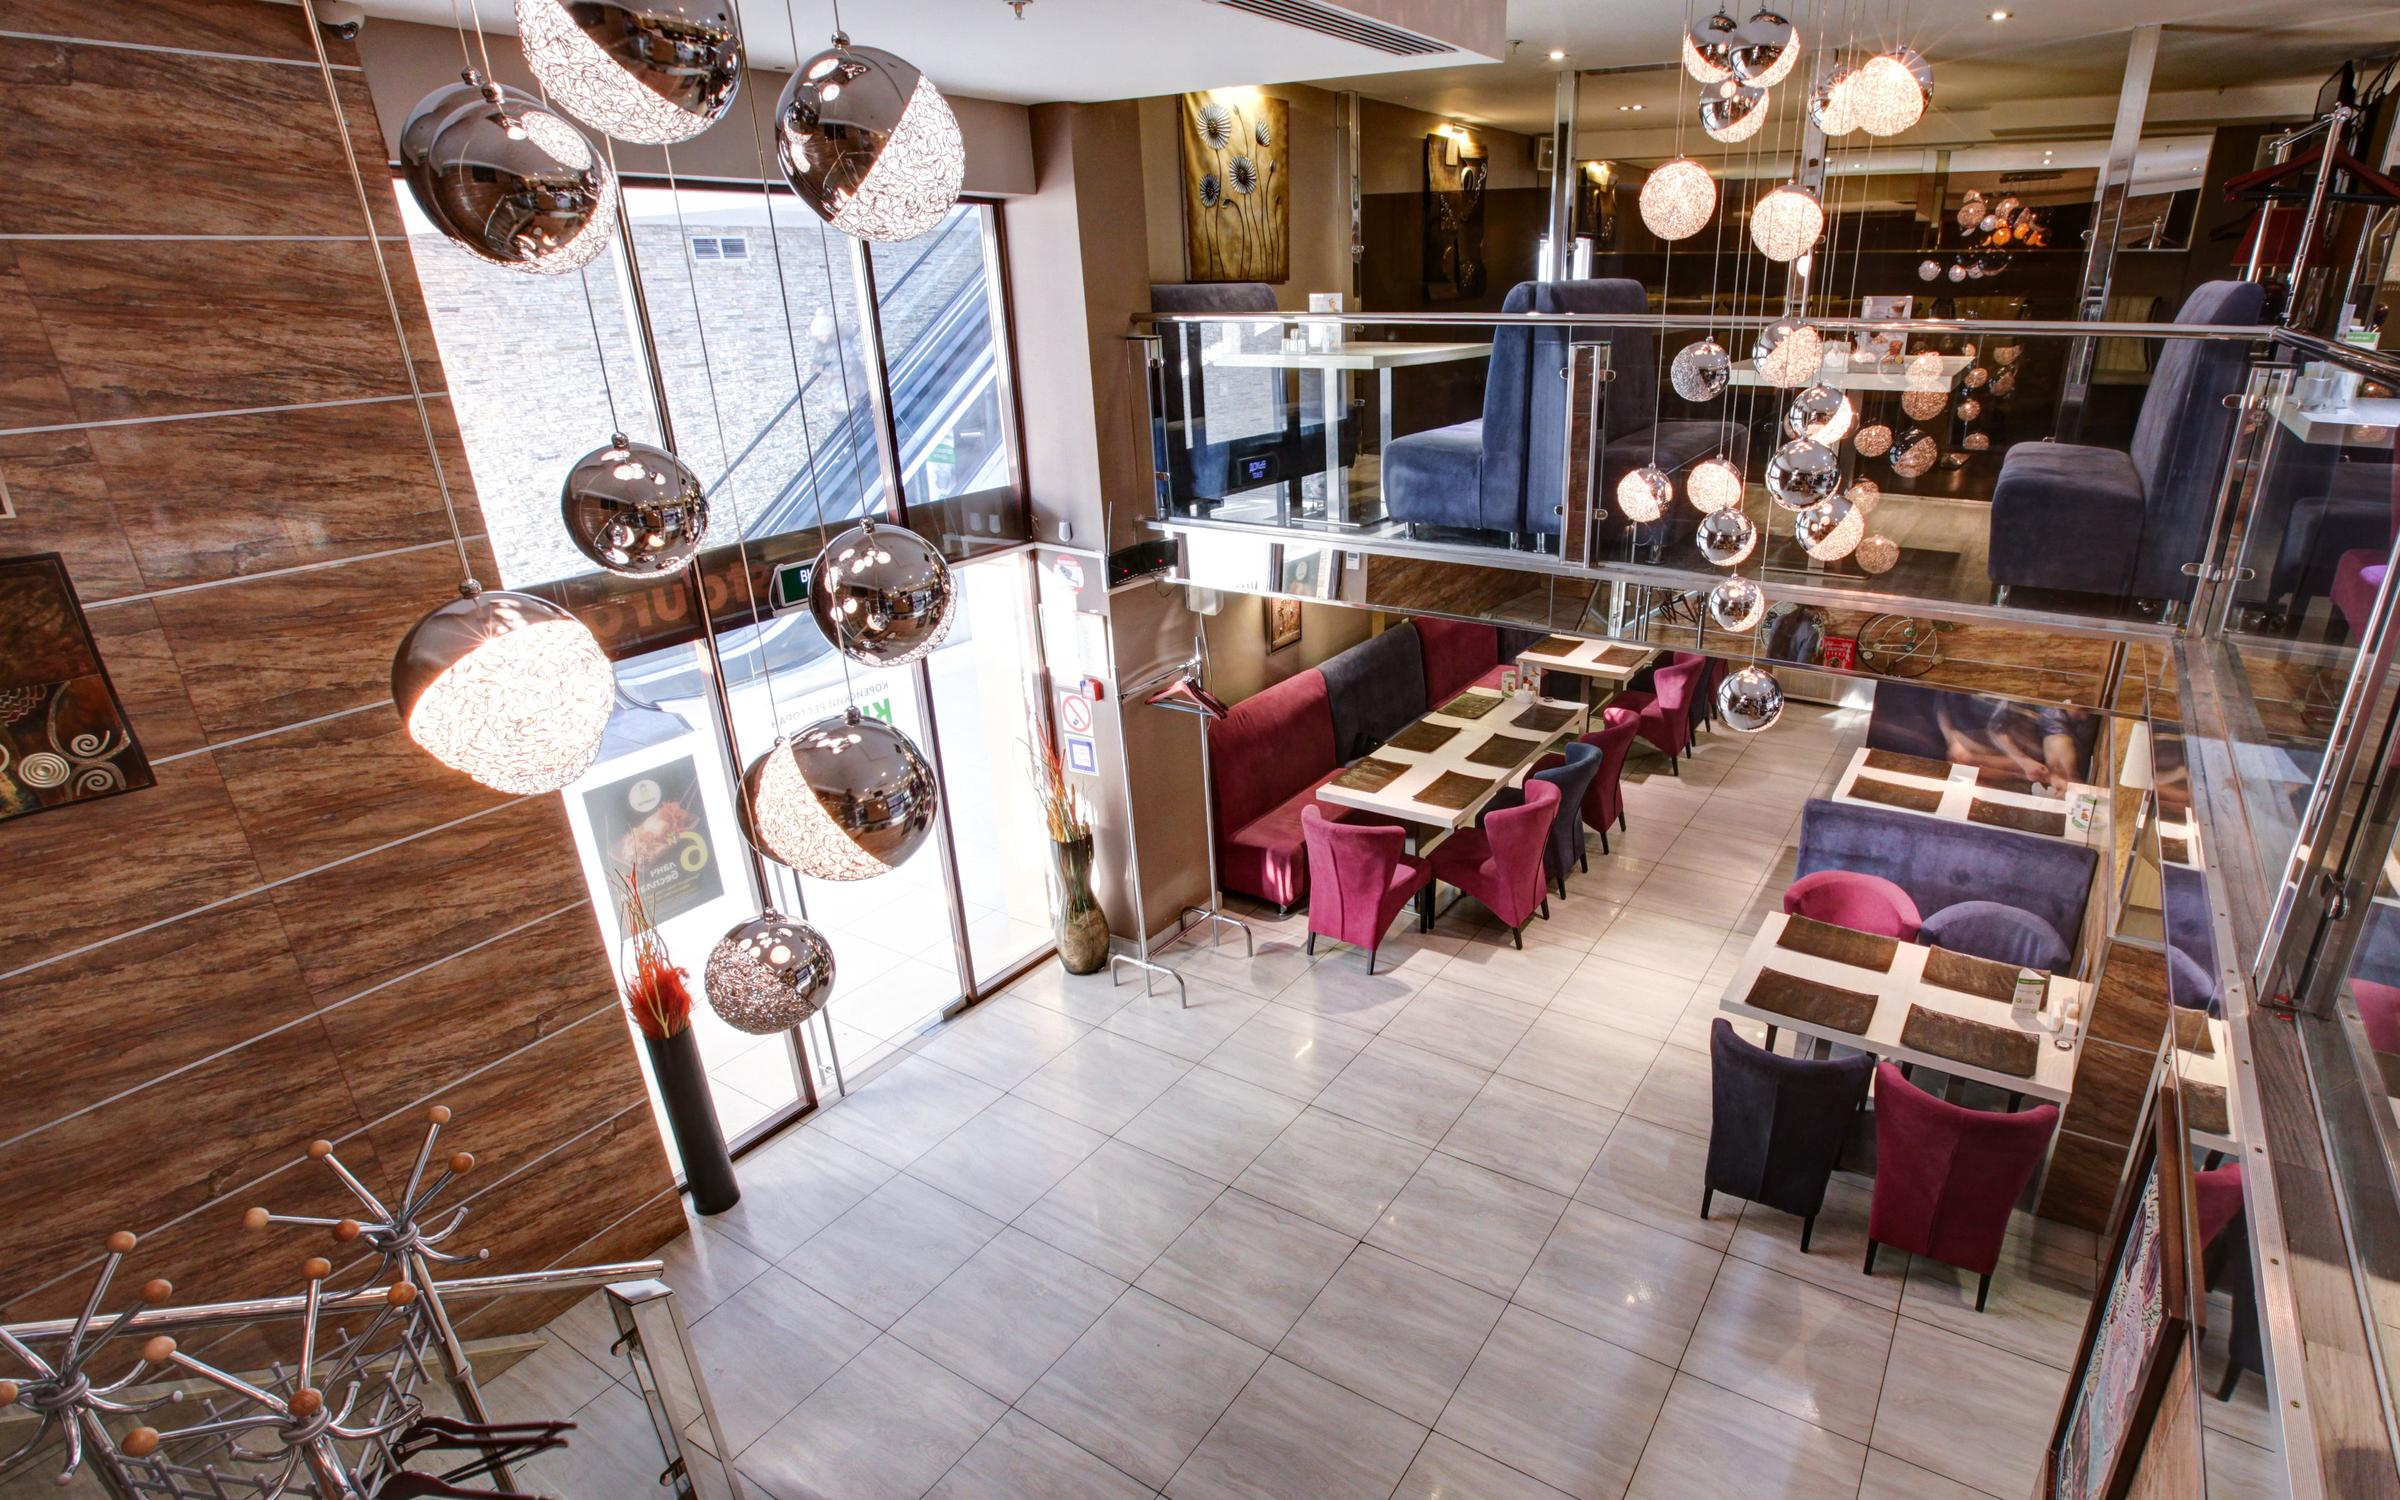 фотография Ресторана корейской кухни КИМЧИ в ТЦ Ямская-Центр